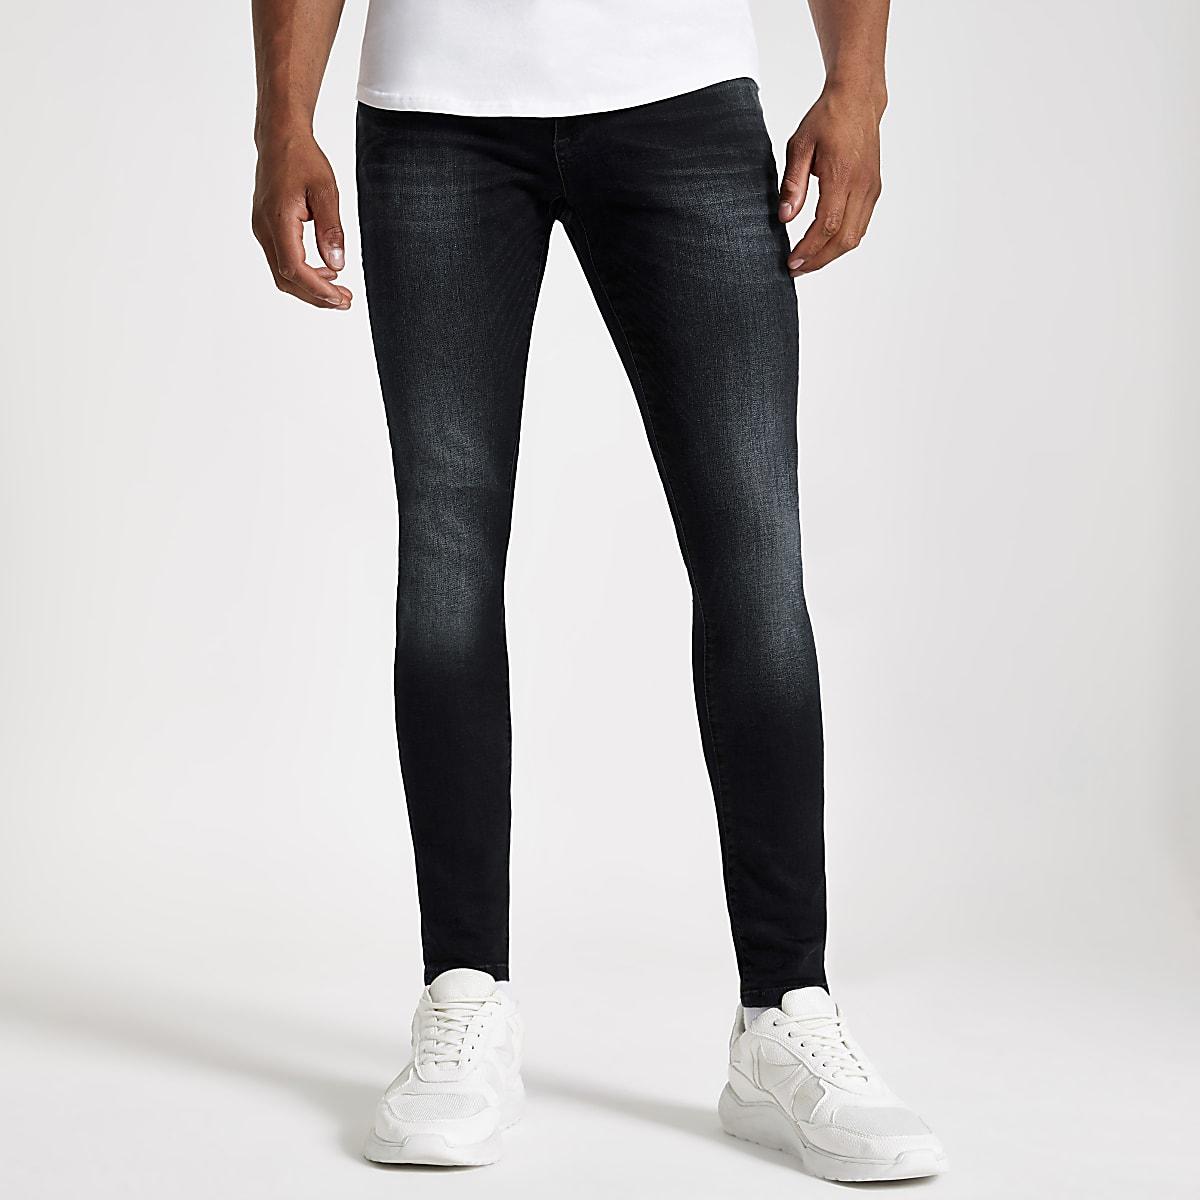 Ollie - Donkerblauwe spray-on jeans